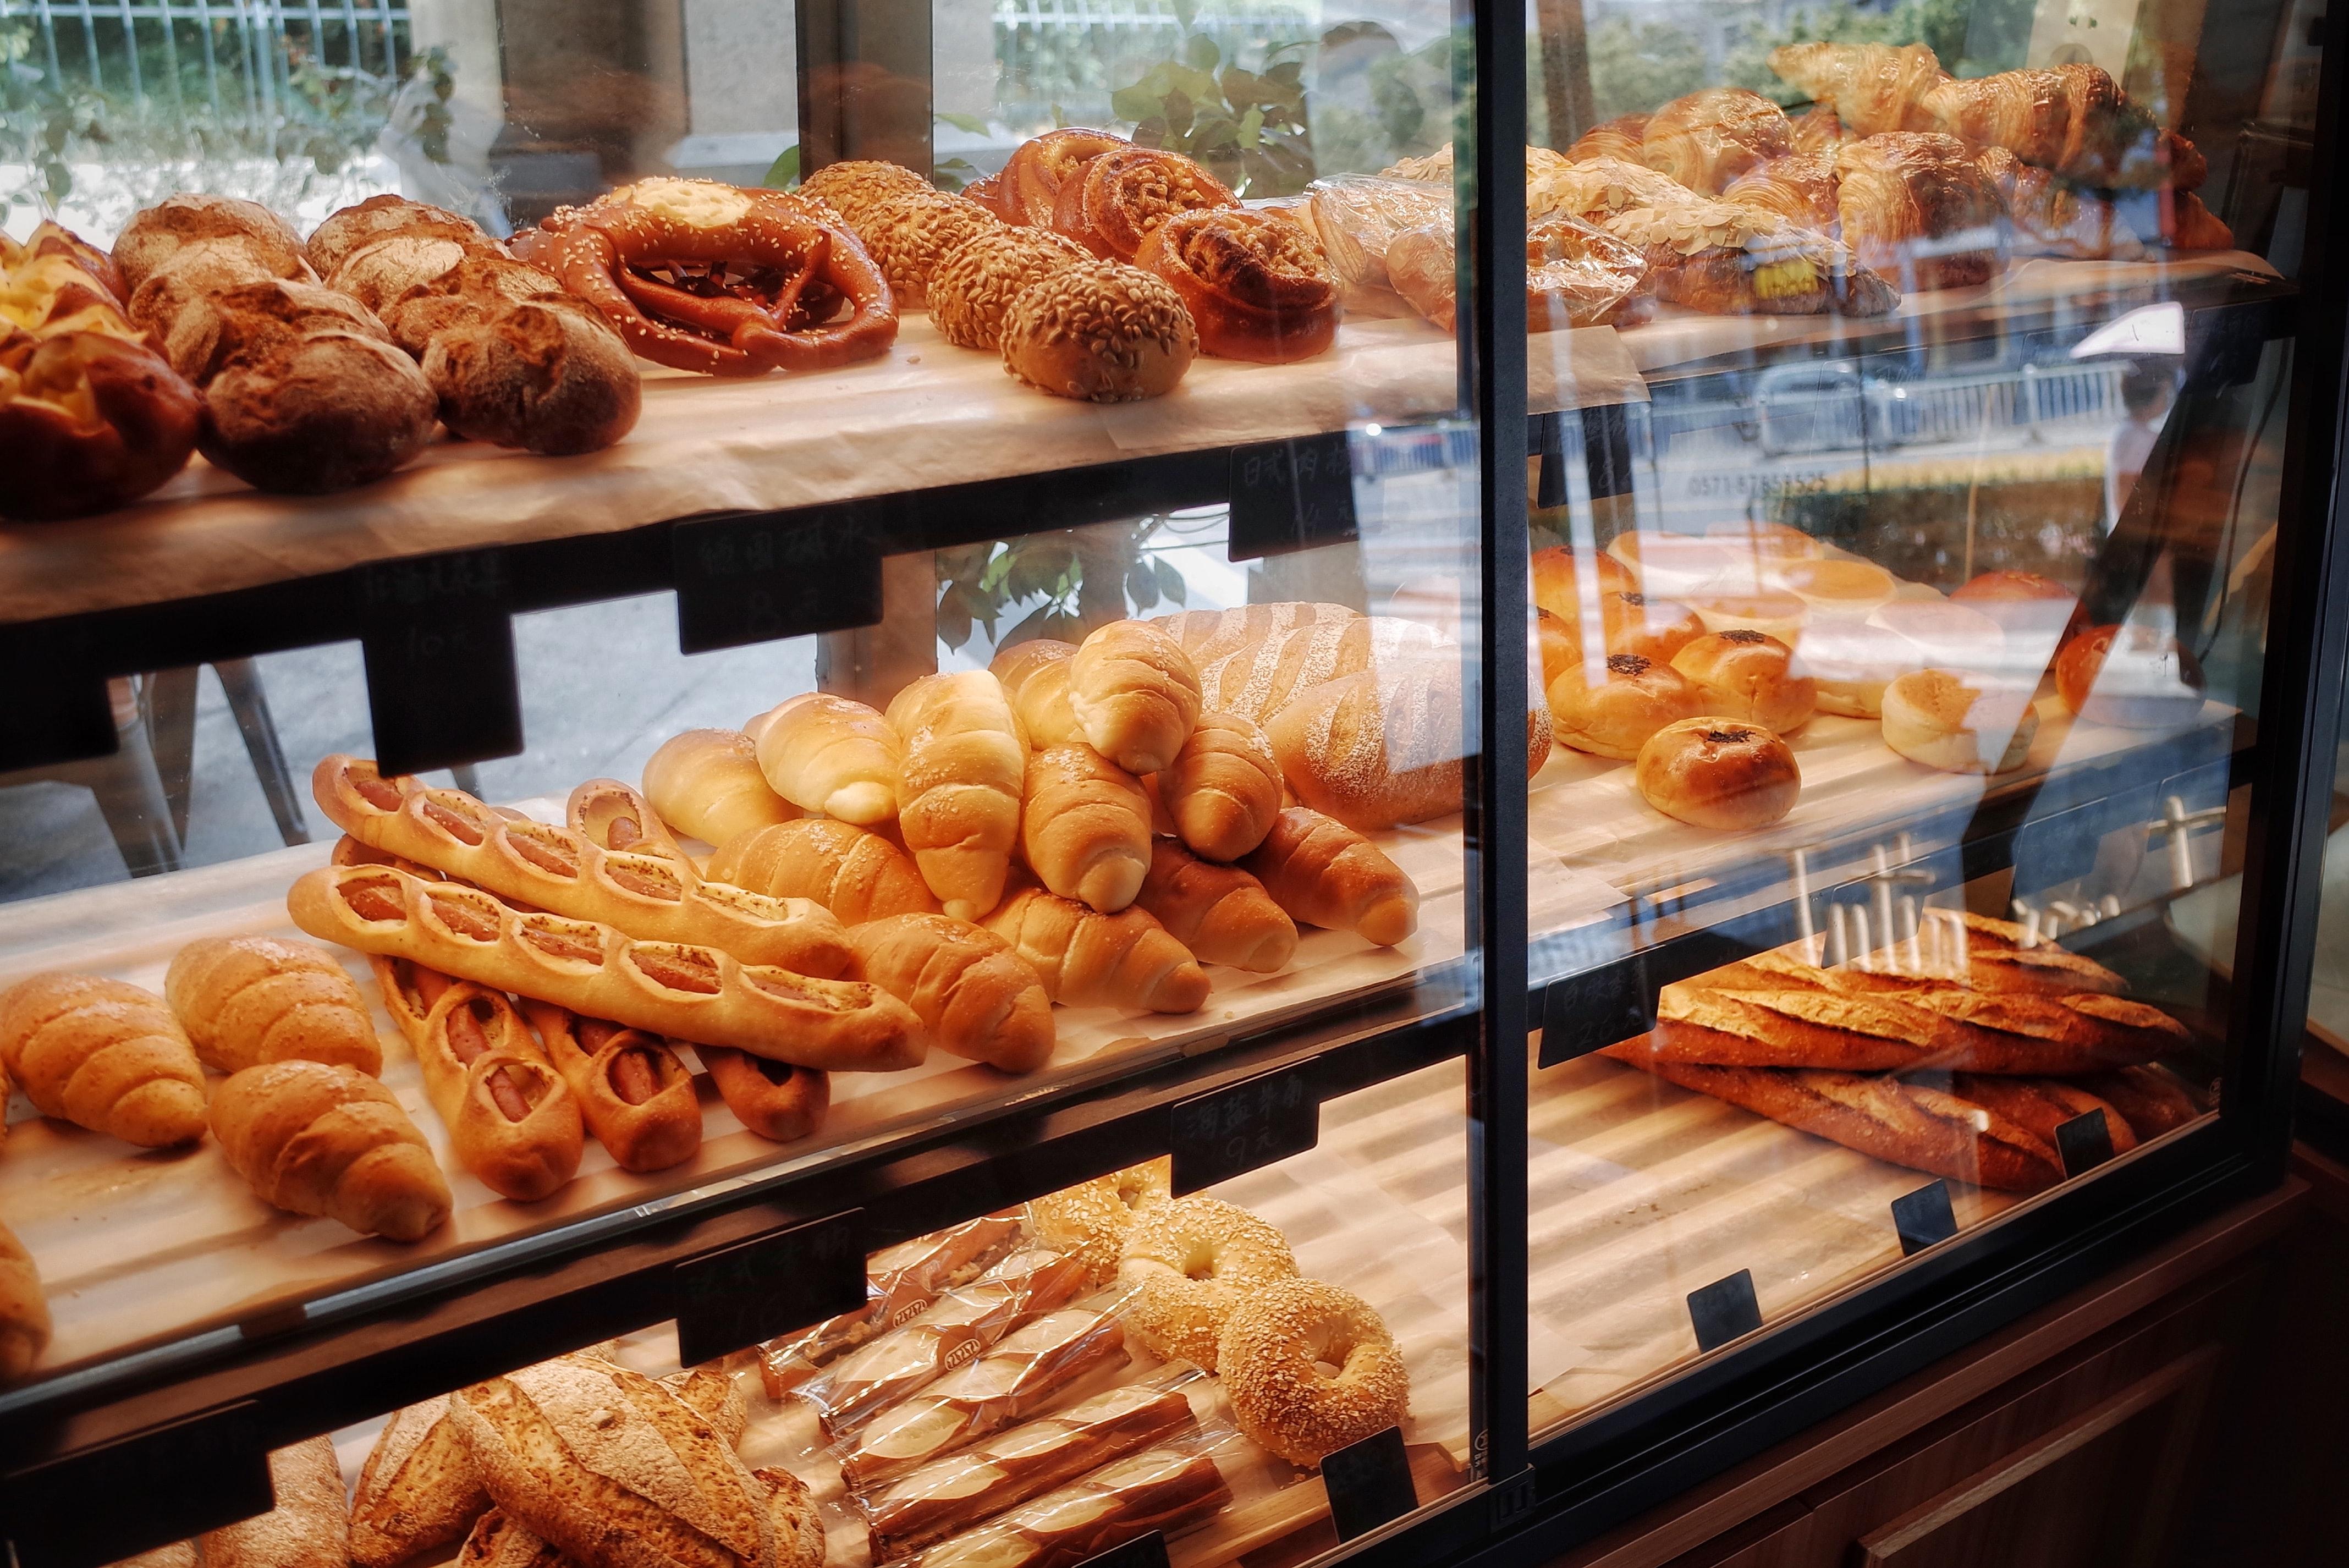 Koopr-Boulangerie-Photo-by-Yeh-Xintong-on-Unsplash